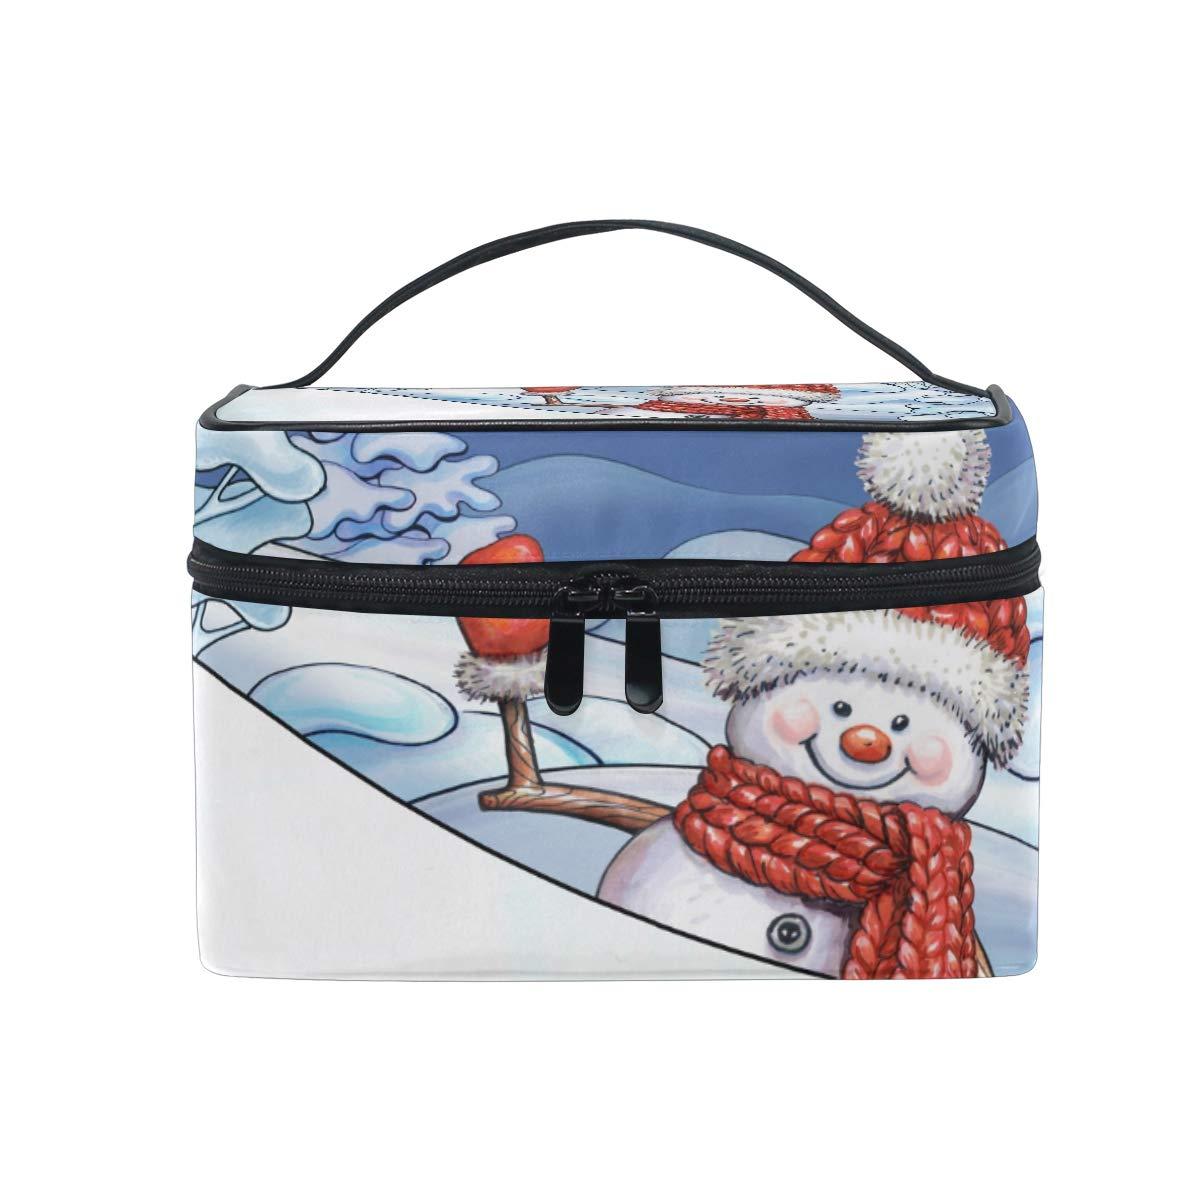 27d1c41f0bb8 Amazon.com : Travel Cosmetic Bag Snowman Tree Toiletry Makeup Bag ...